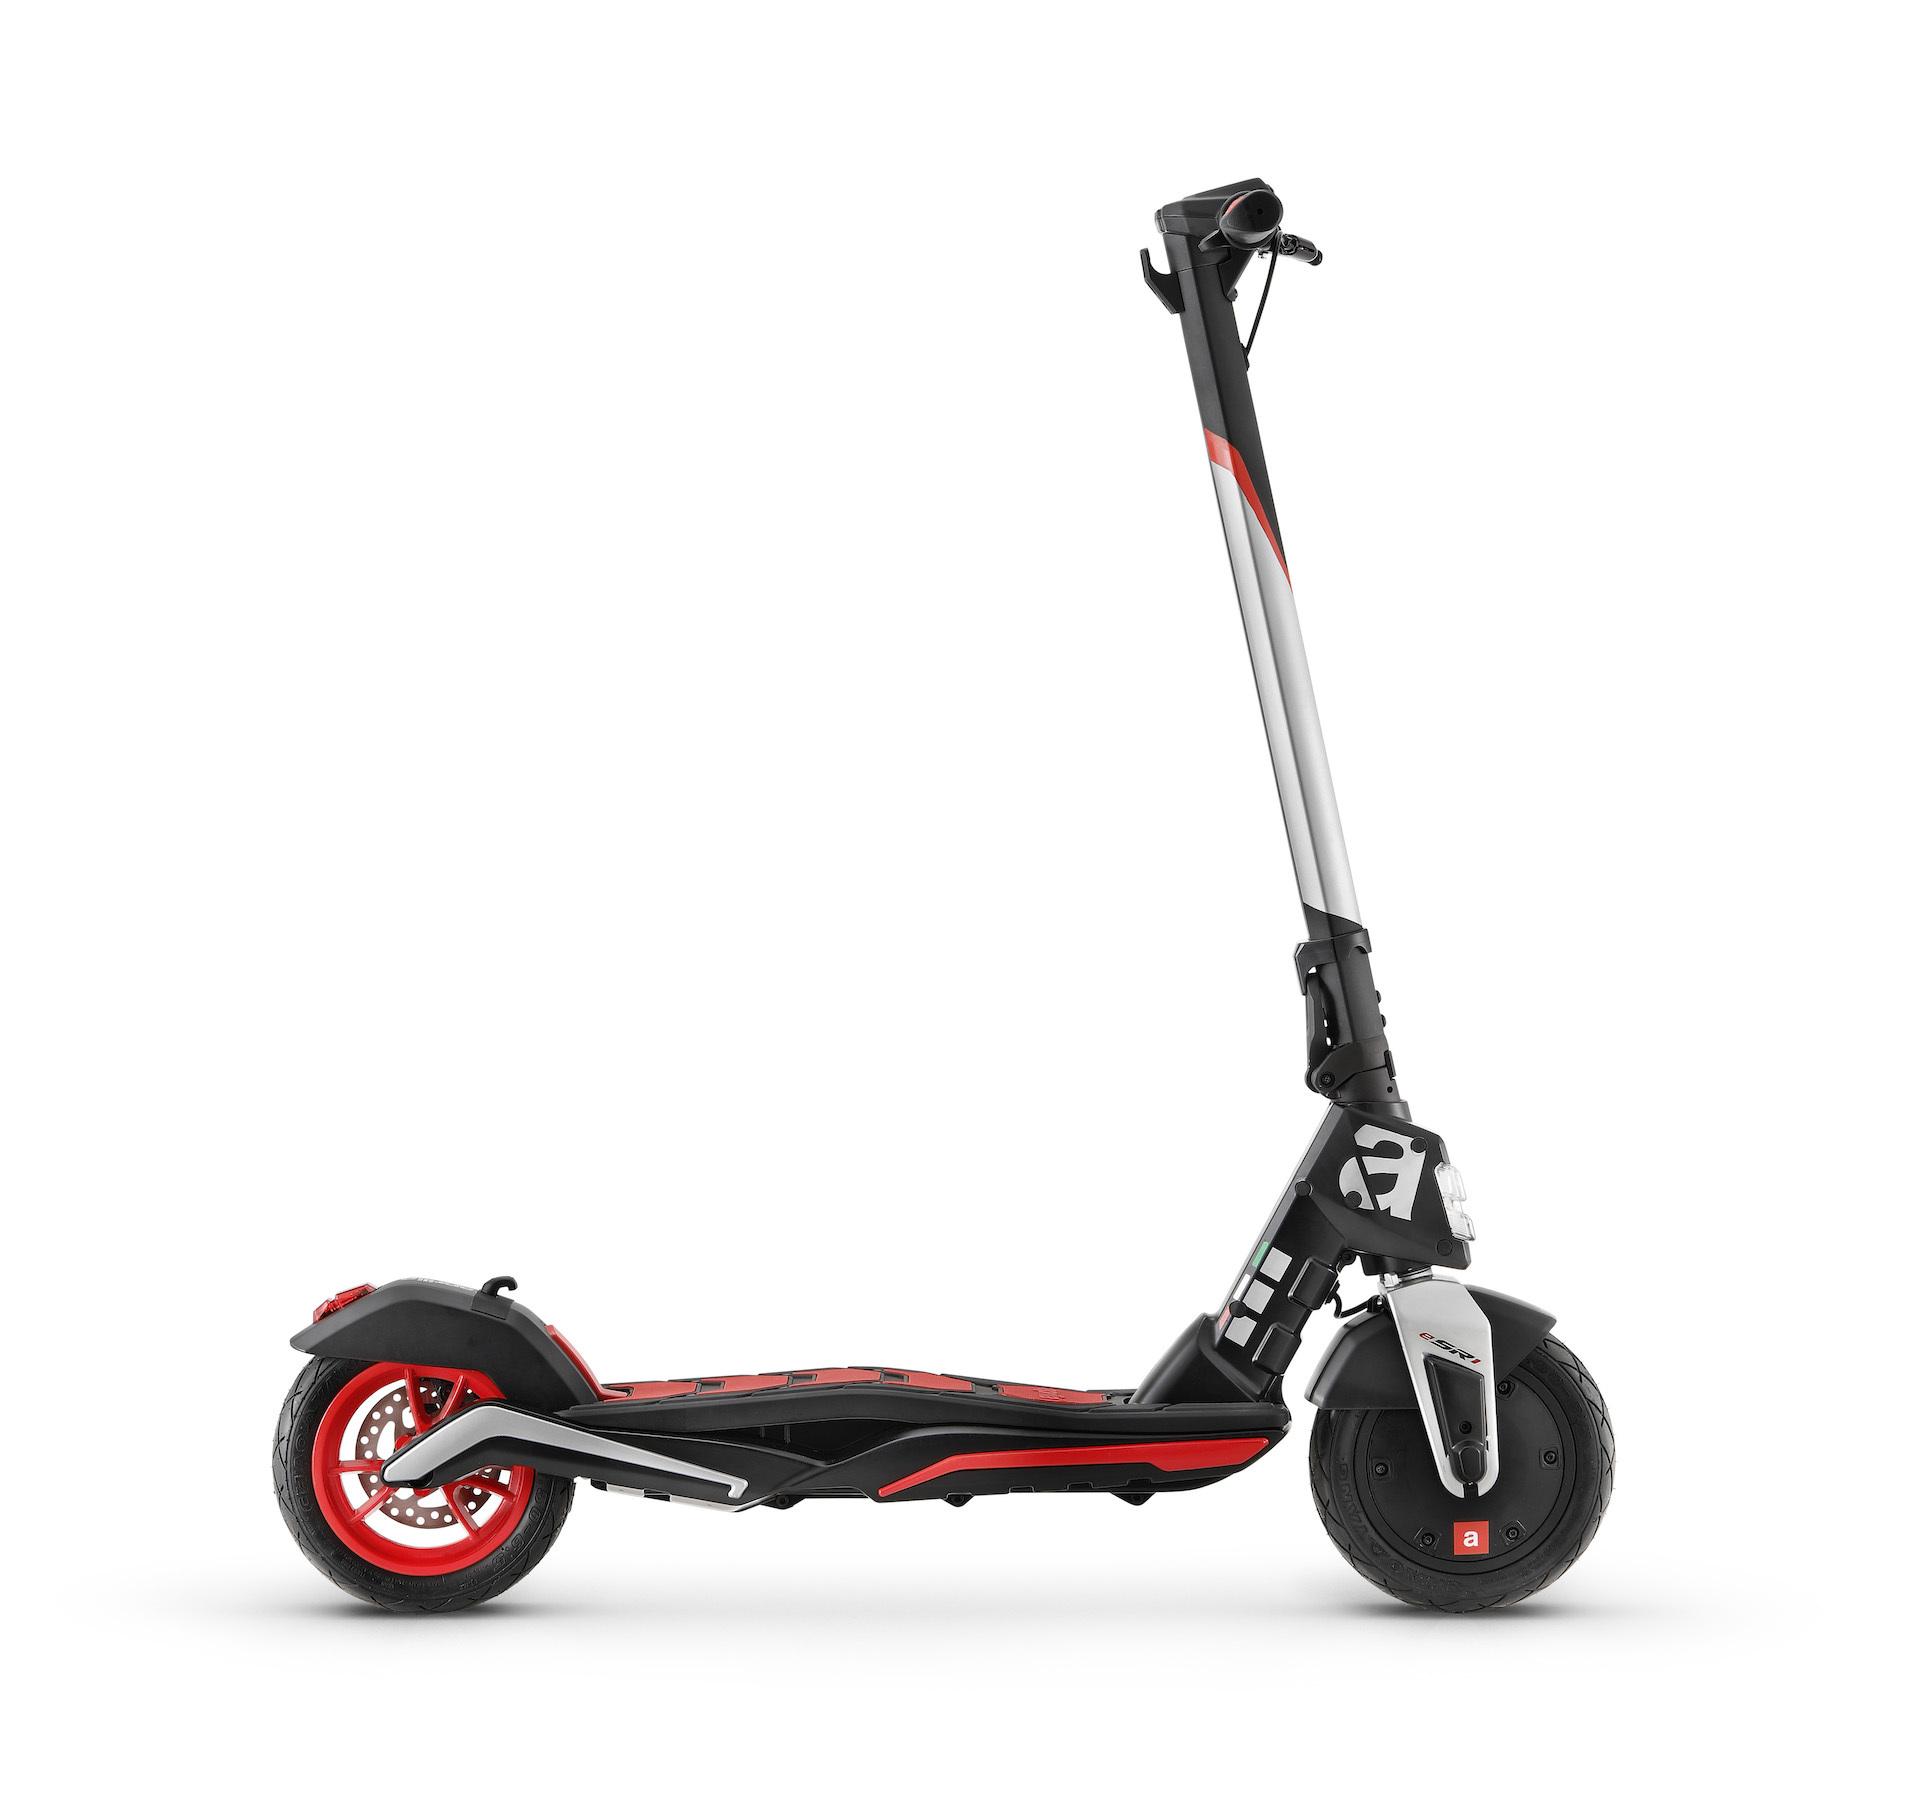 Scooter Aprilia Esr1 3